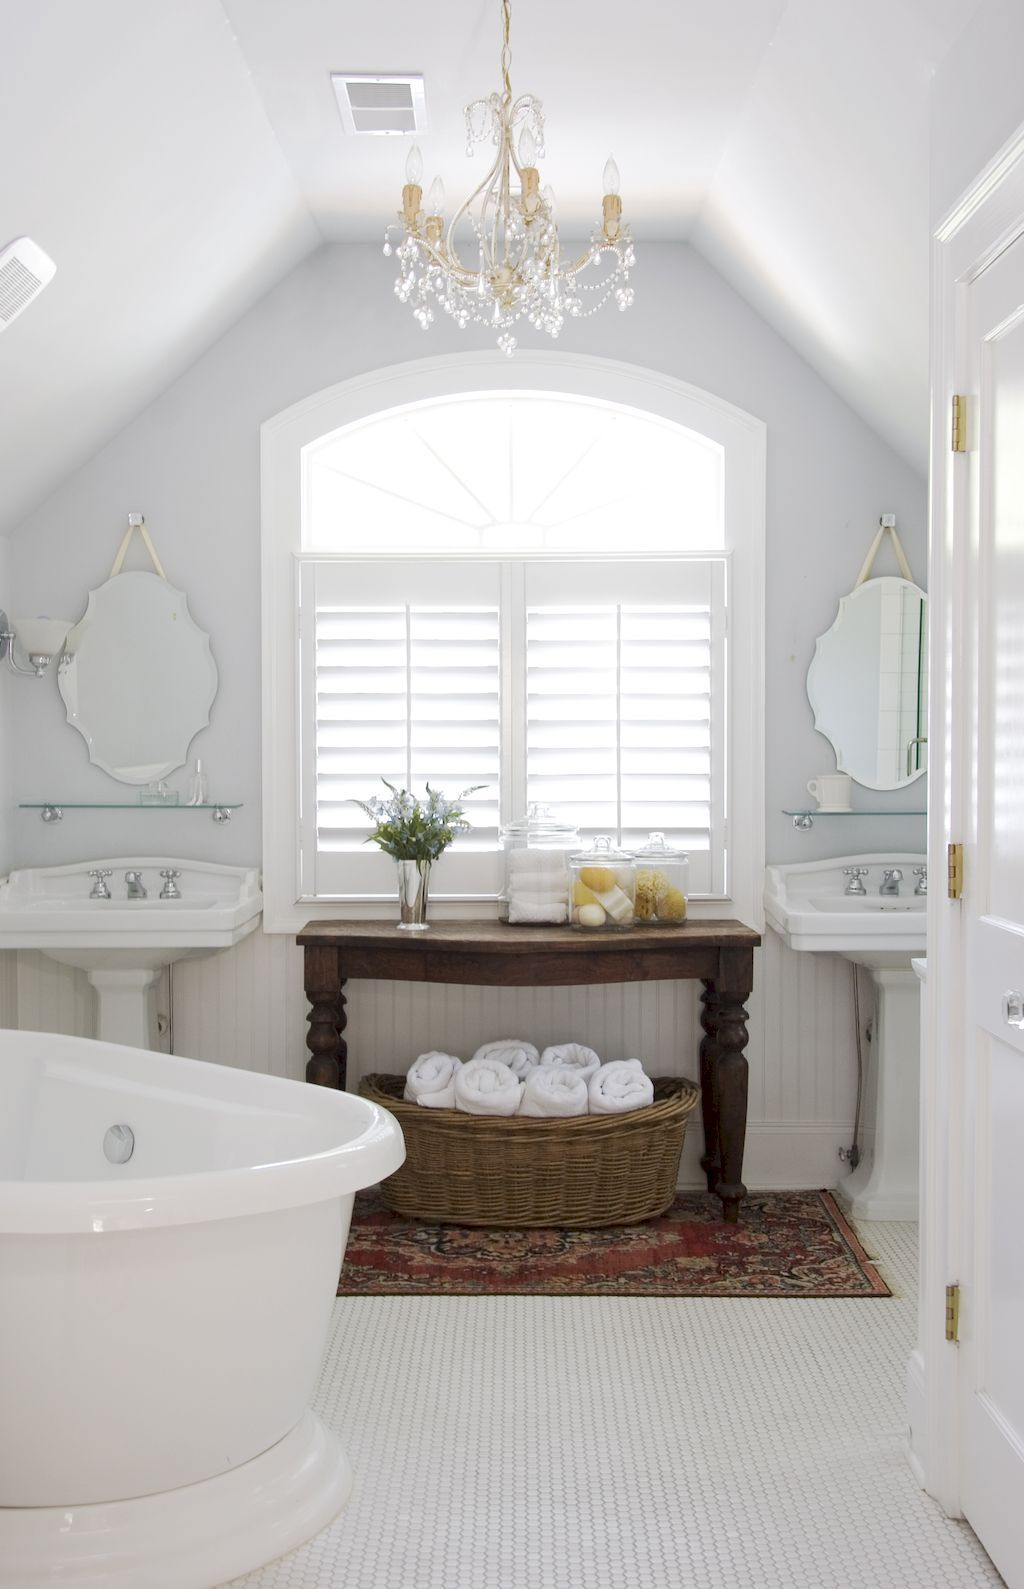 70 Cool Attic Bathroom Remodel Ideas | Attic bathroom, Attic and ...